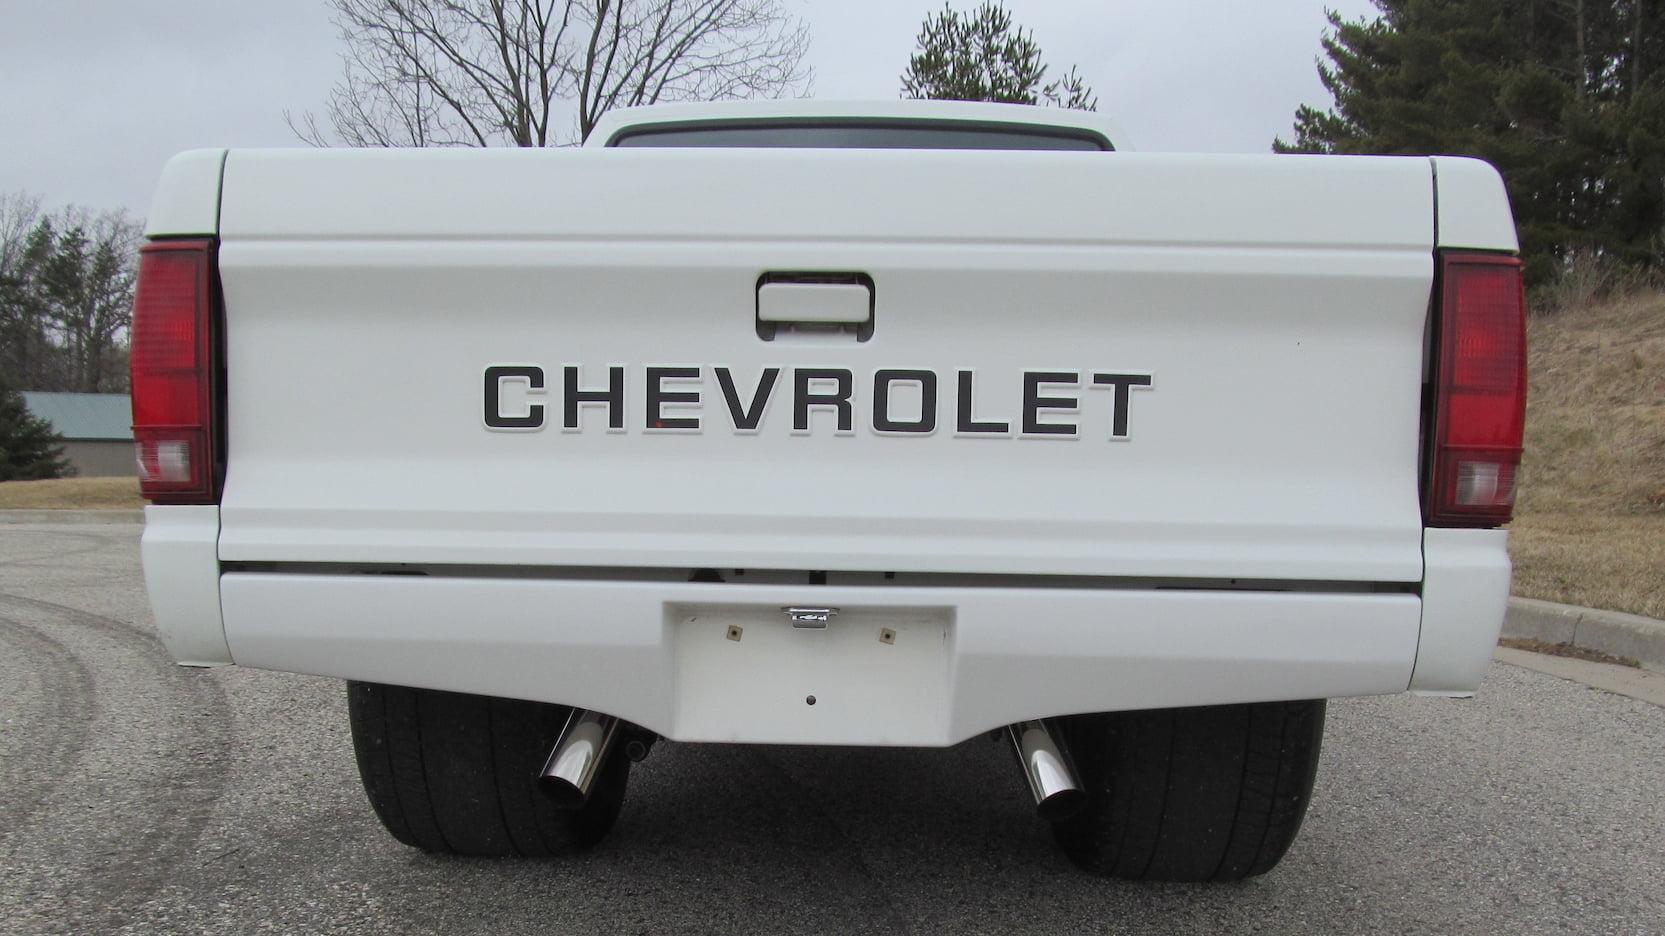 1987 Chevrolet S10 tailgate